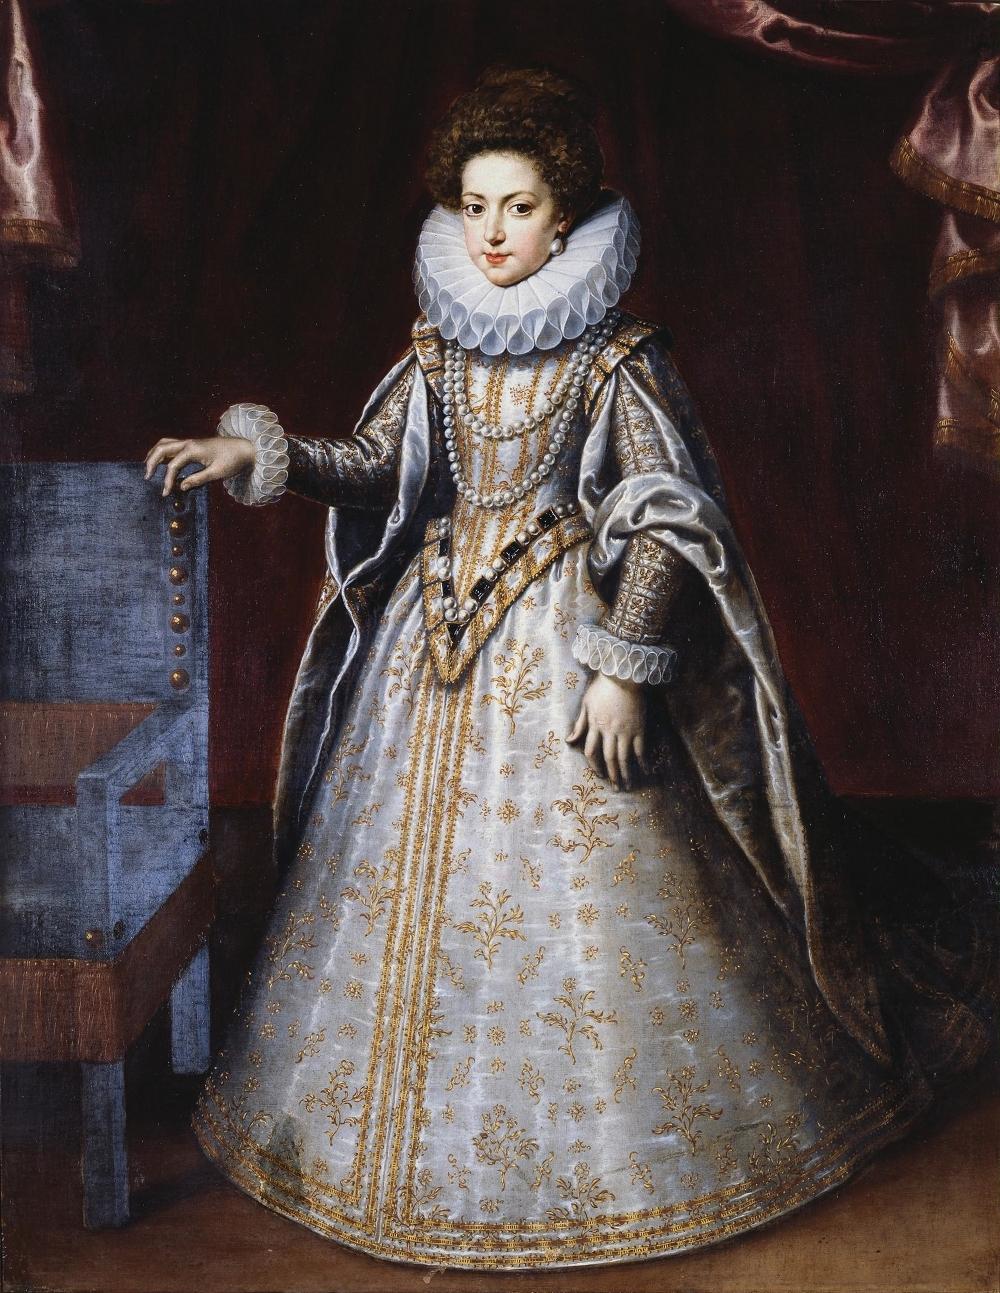 Isabel de Francia wbarokowej sukni